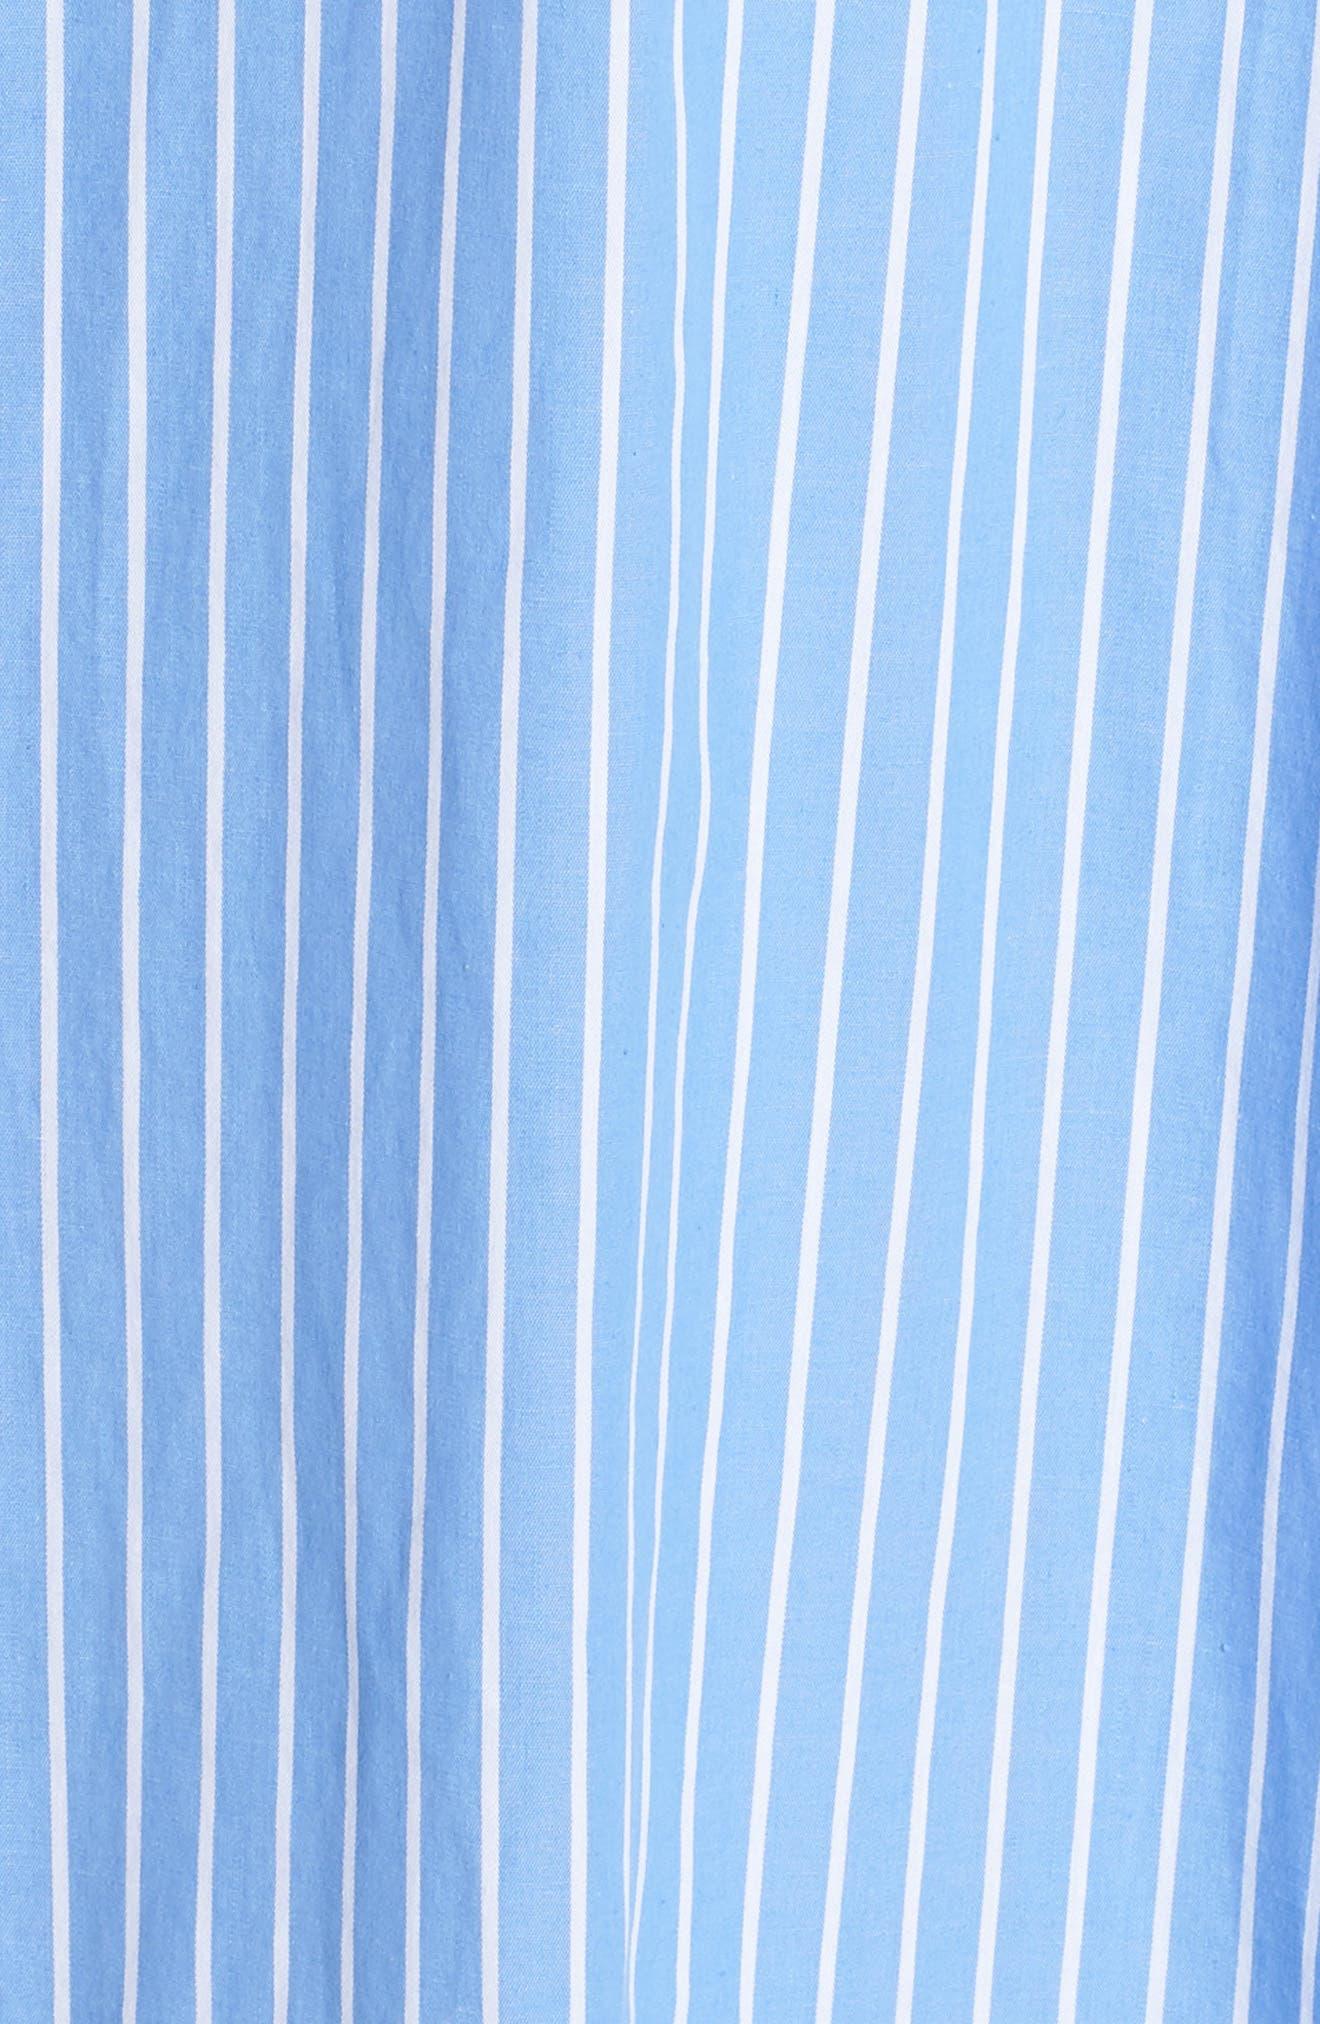 Becky Bow Front Tea Length Dress,                             Alternate thumbnail 6, color,                             Pale Blue/ White Stripe